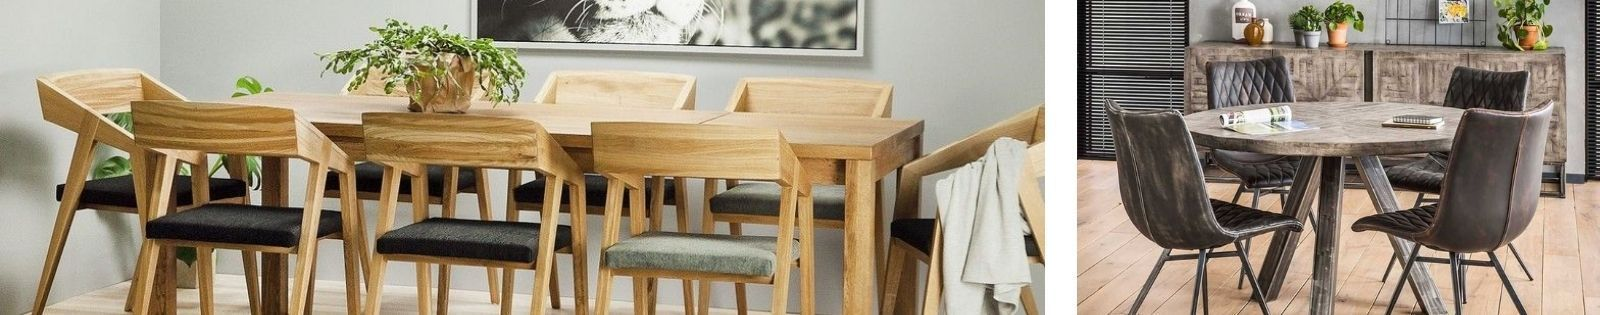 Meubles de salle à manger bois massif : chêne,hévéa,acacia,teck,bambou